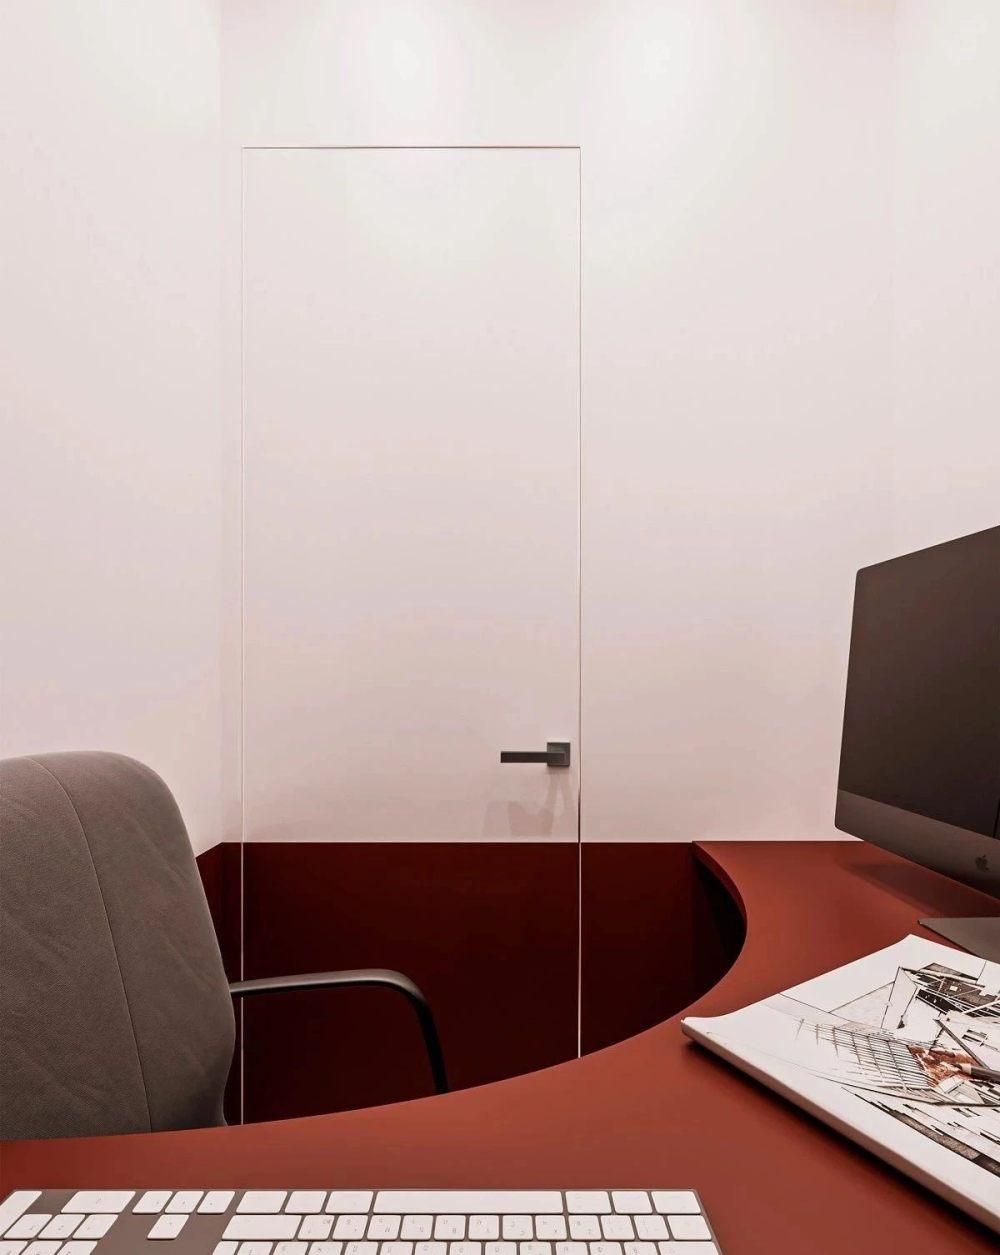 【ZROBYM architects】白俄罗斯明斯克州 高颜值、高质感住宅  _白俄罗斯明斯克州高颜值、高质感住宅10.jpg